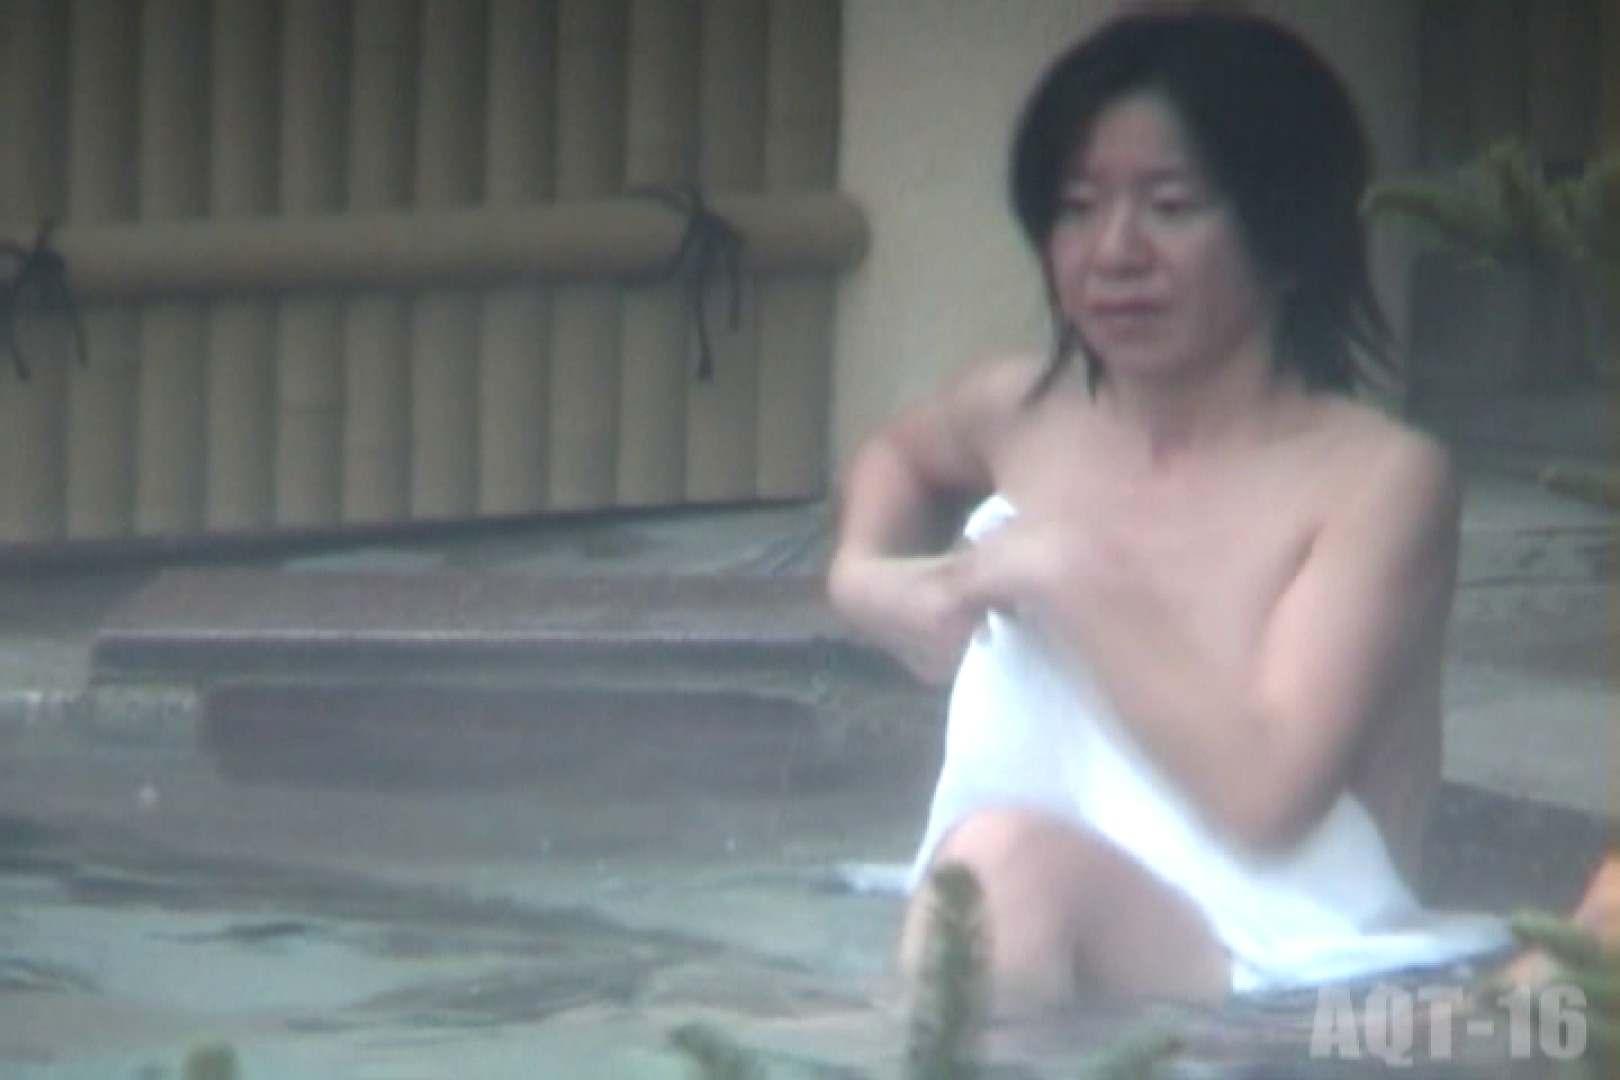 Aquaな露天風呂Vol.841 露天 のぞき動画キャプチャ 86pic 79